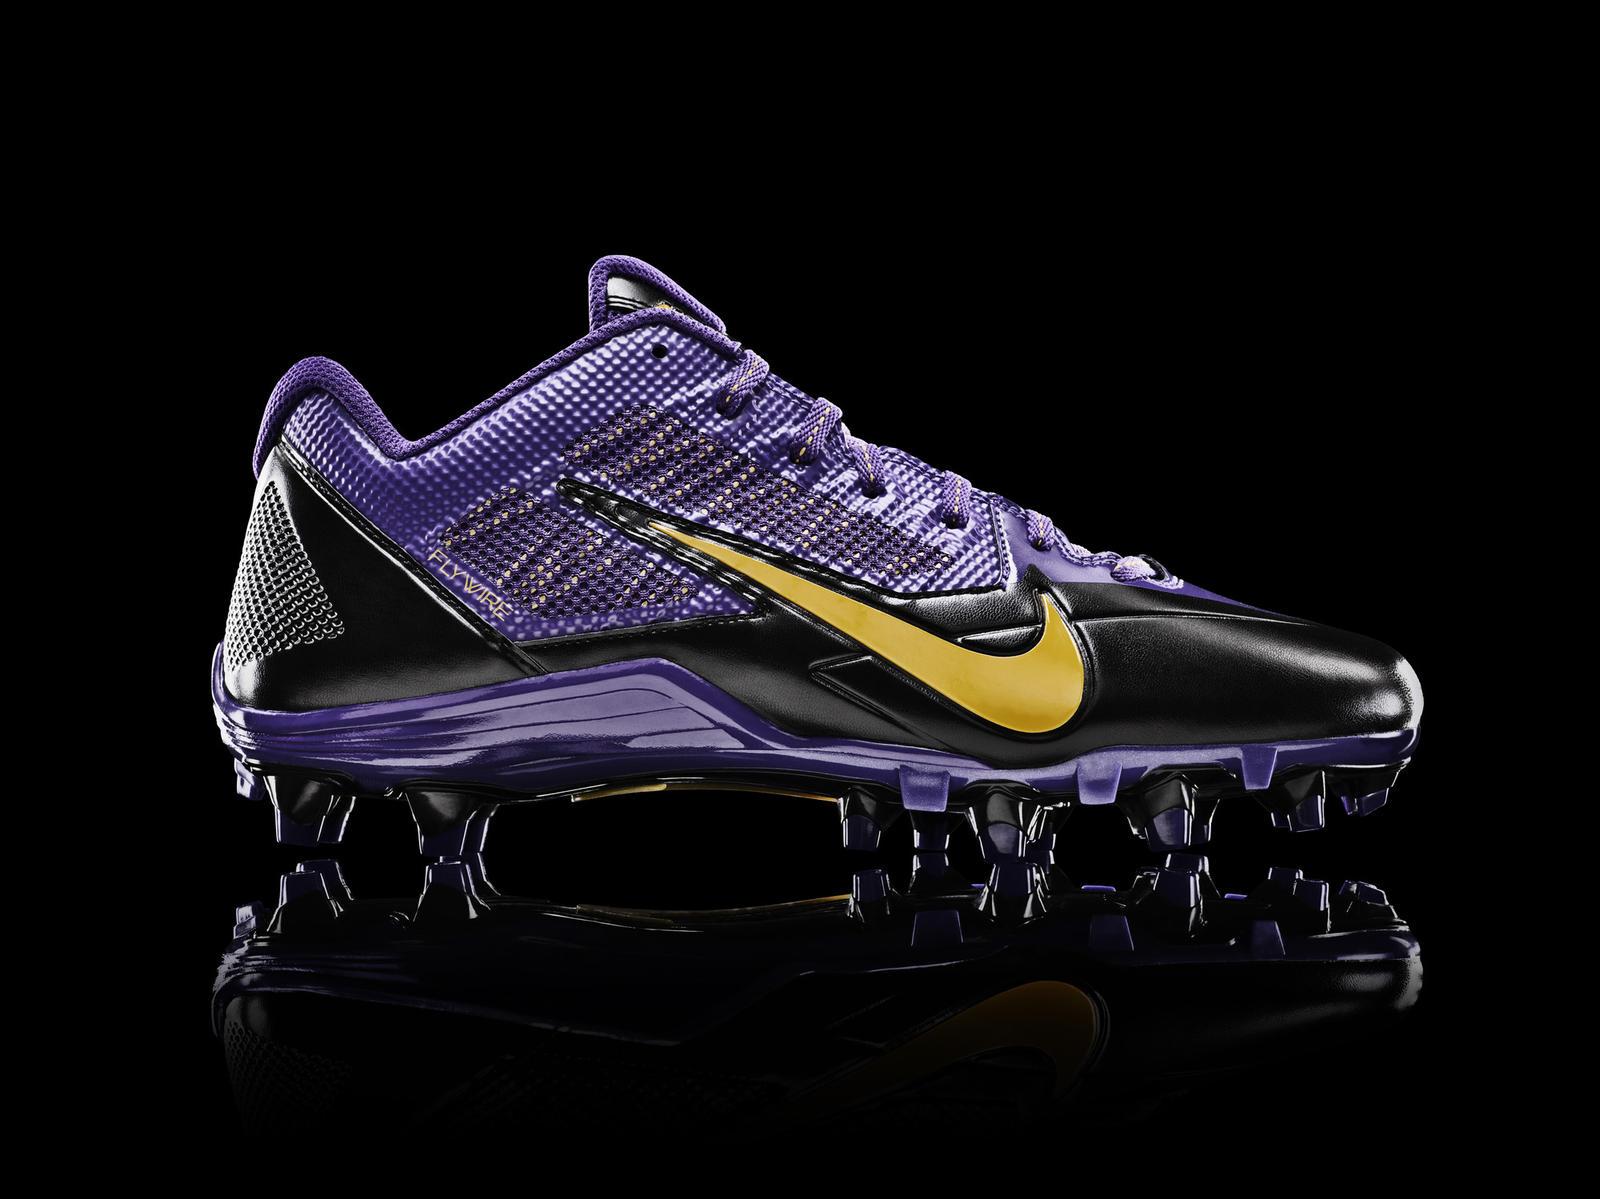 Nike Wvu Tennis Shoes